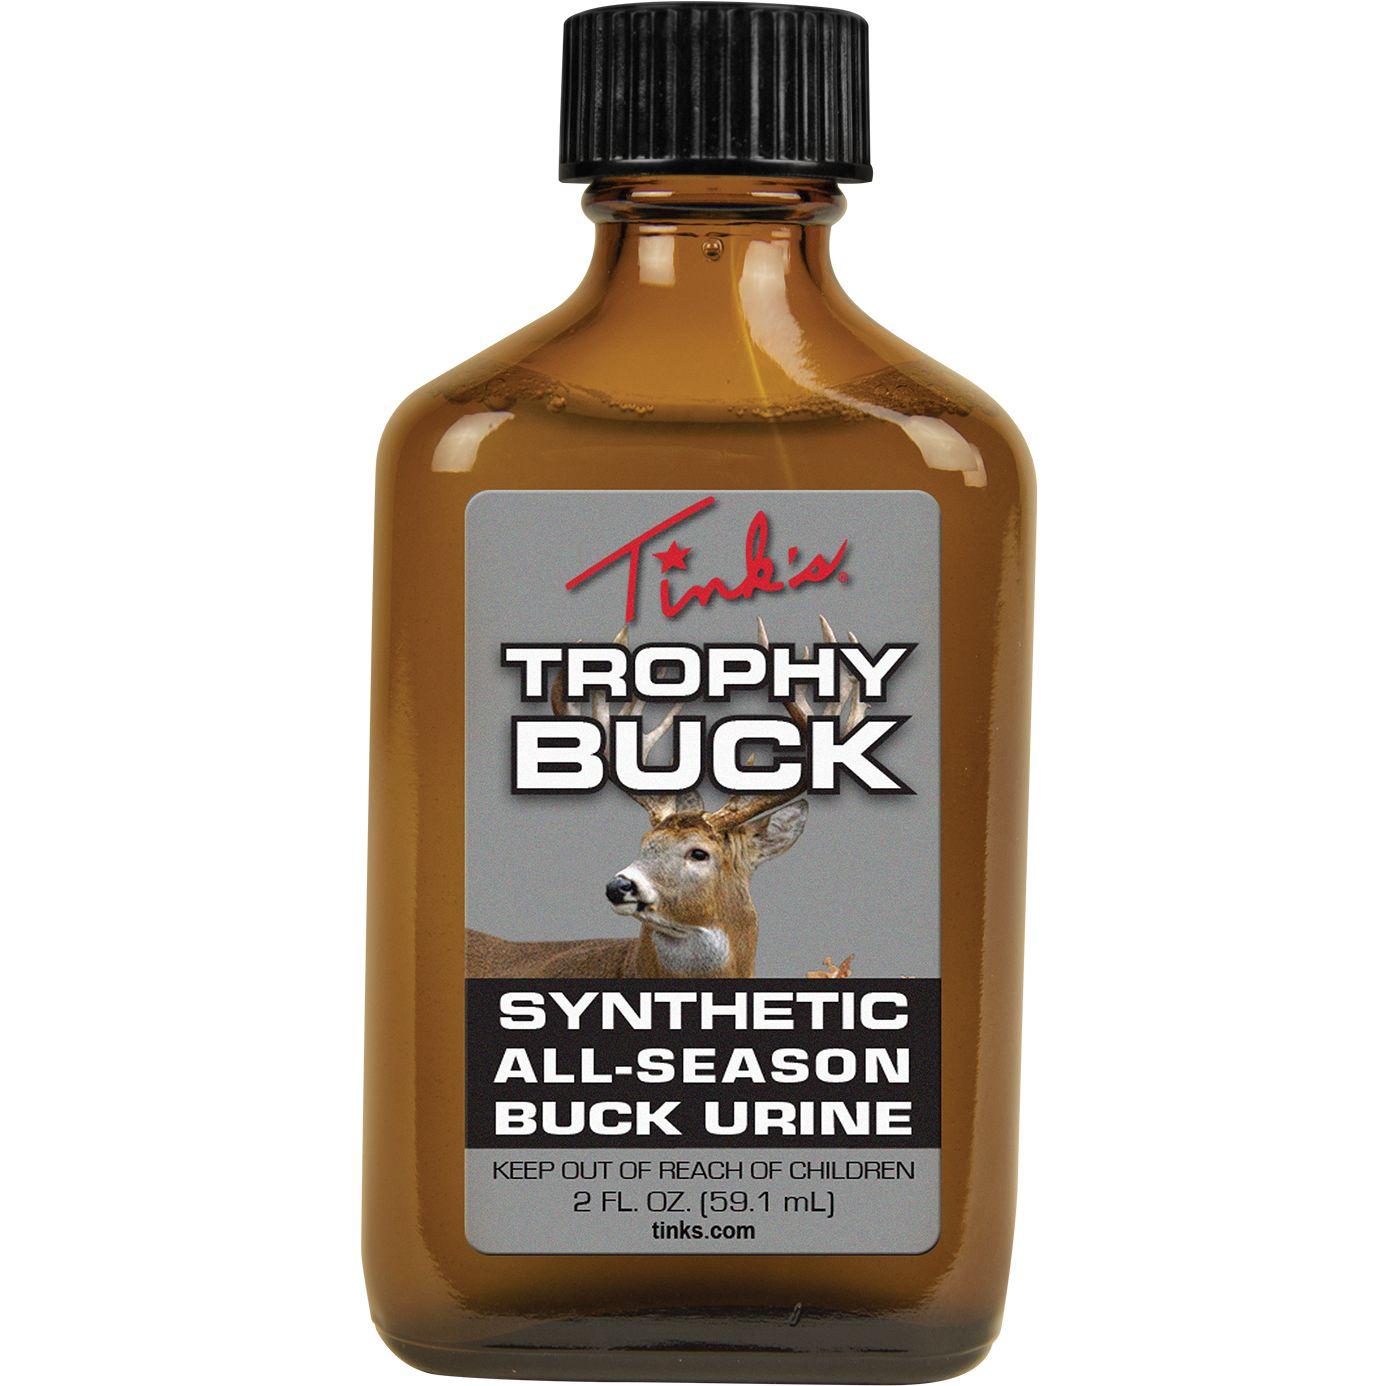 Tink's Trophy Buck Synthetic Dominant Buck Urine Deer Attractant